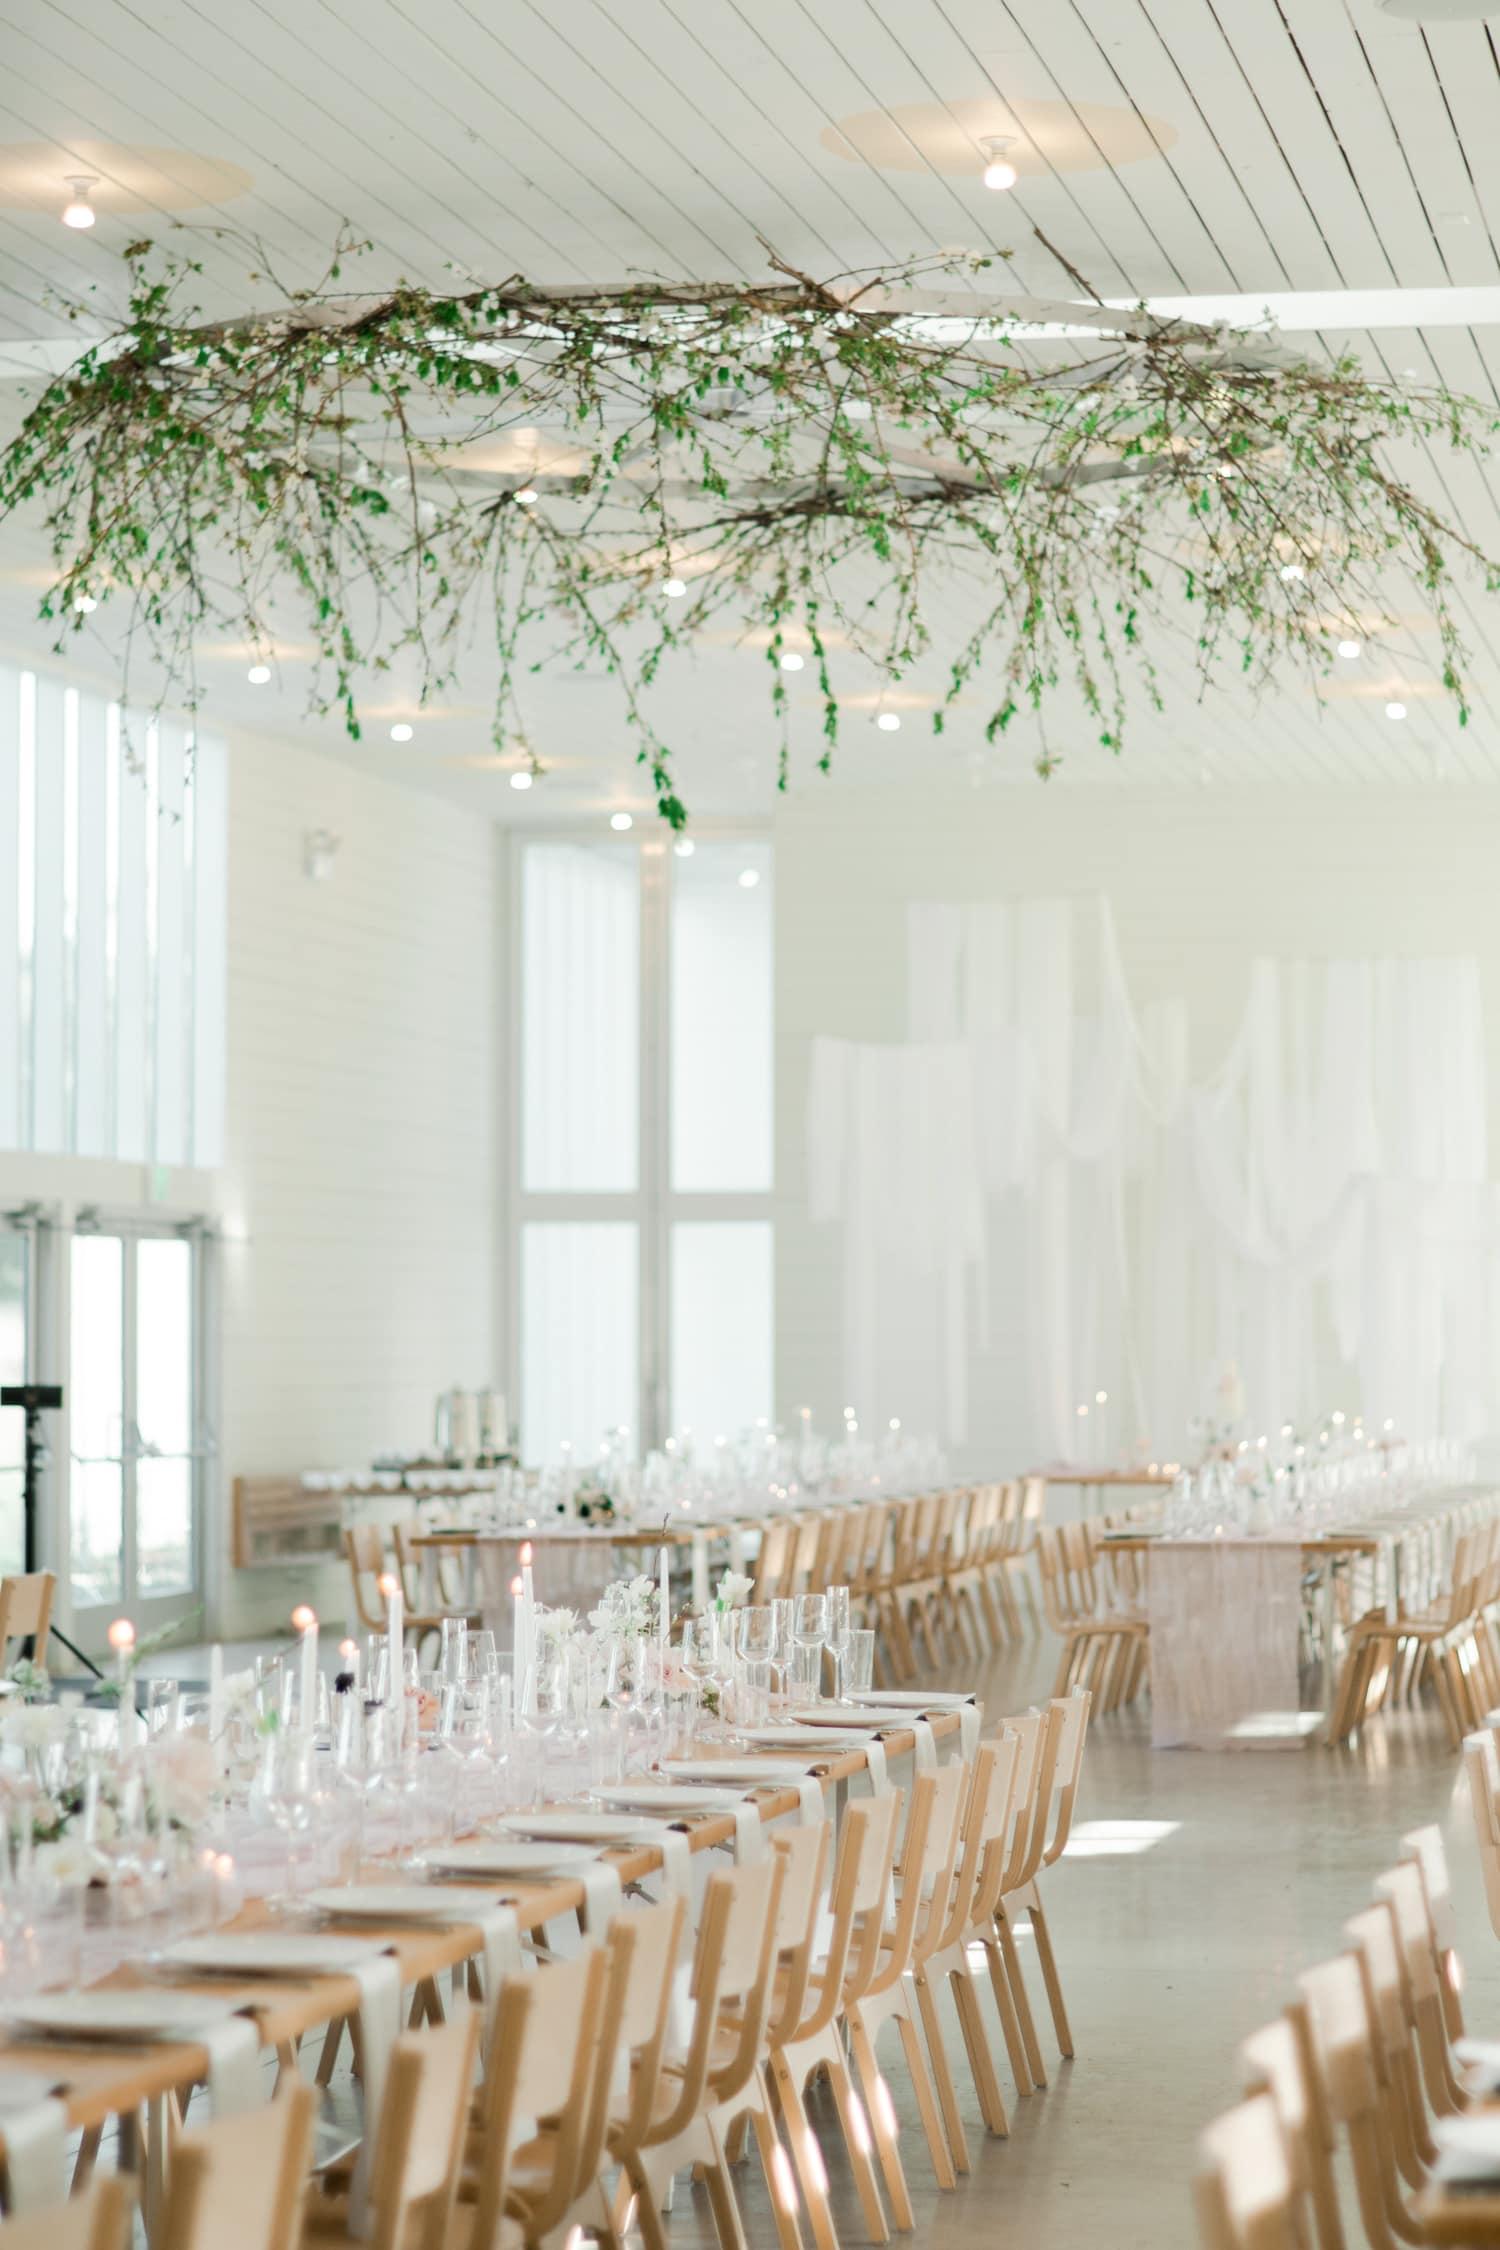 PROSPECT_HOUSE_WEDDING_AUSTIN_TX_MATTHEW_MOORE-00624.jpg